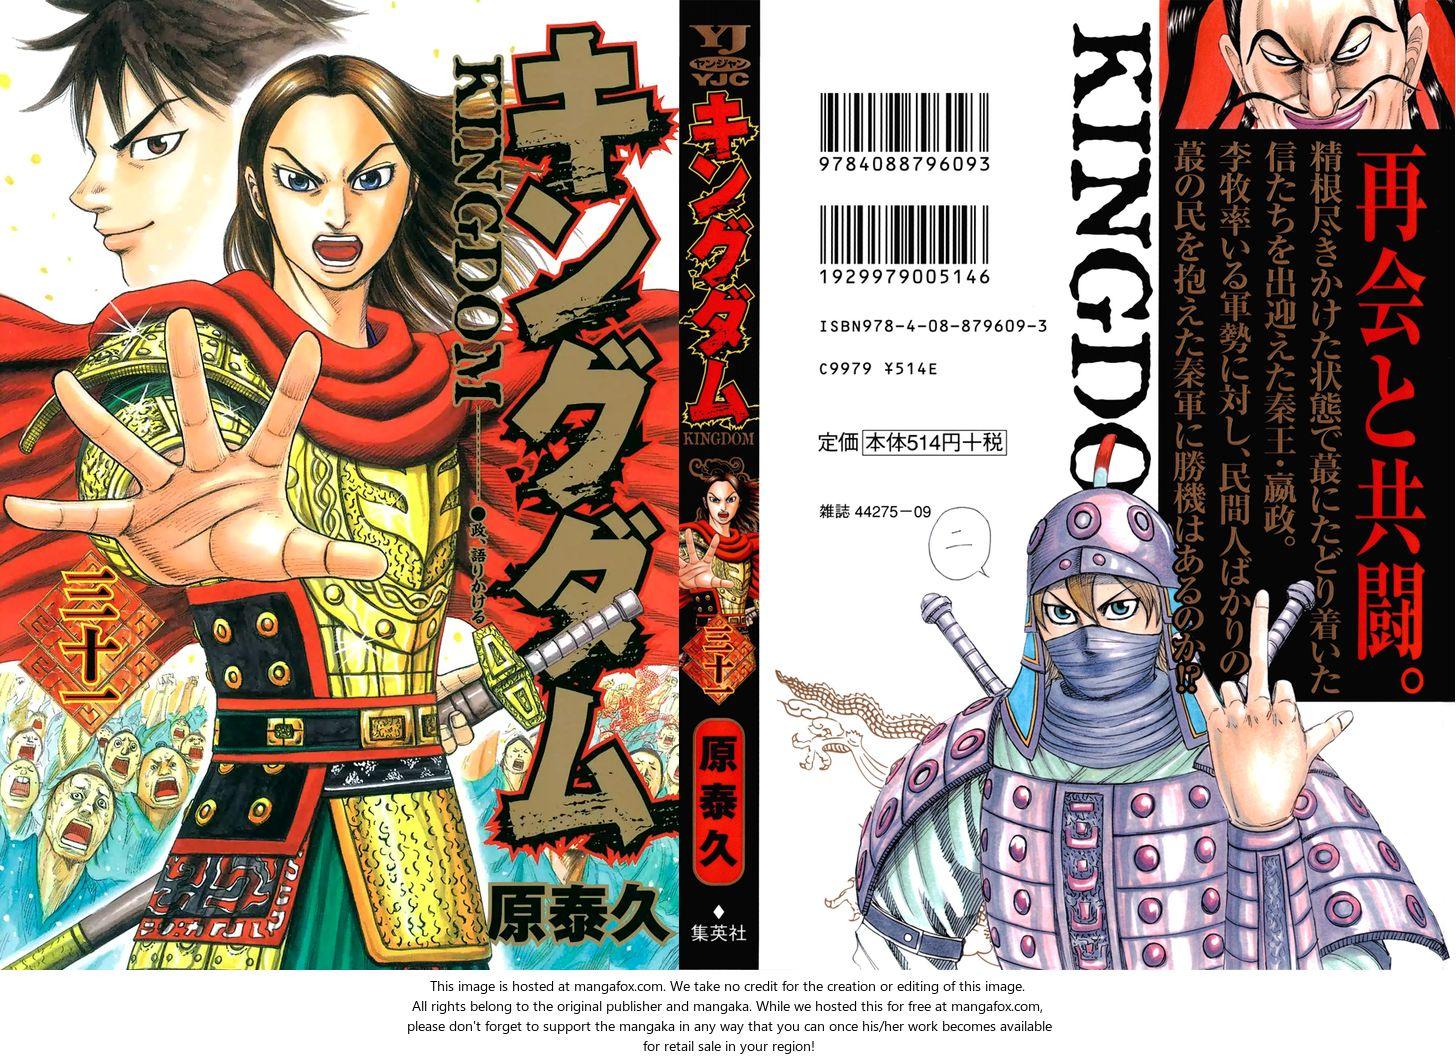 Kingdom 328: The Vacated Throne at MangaFox